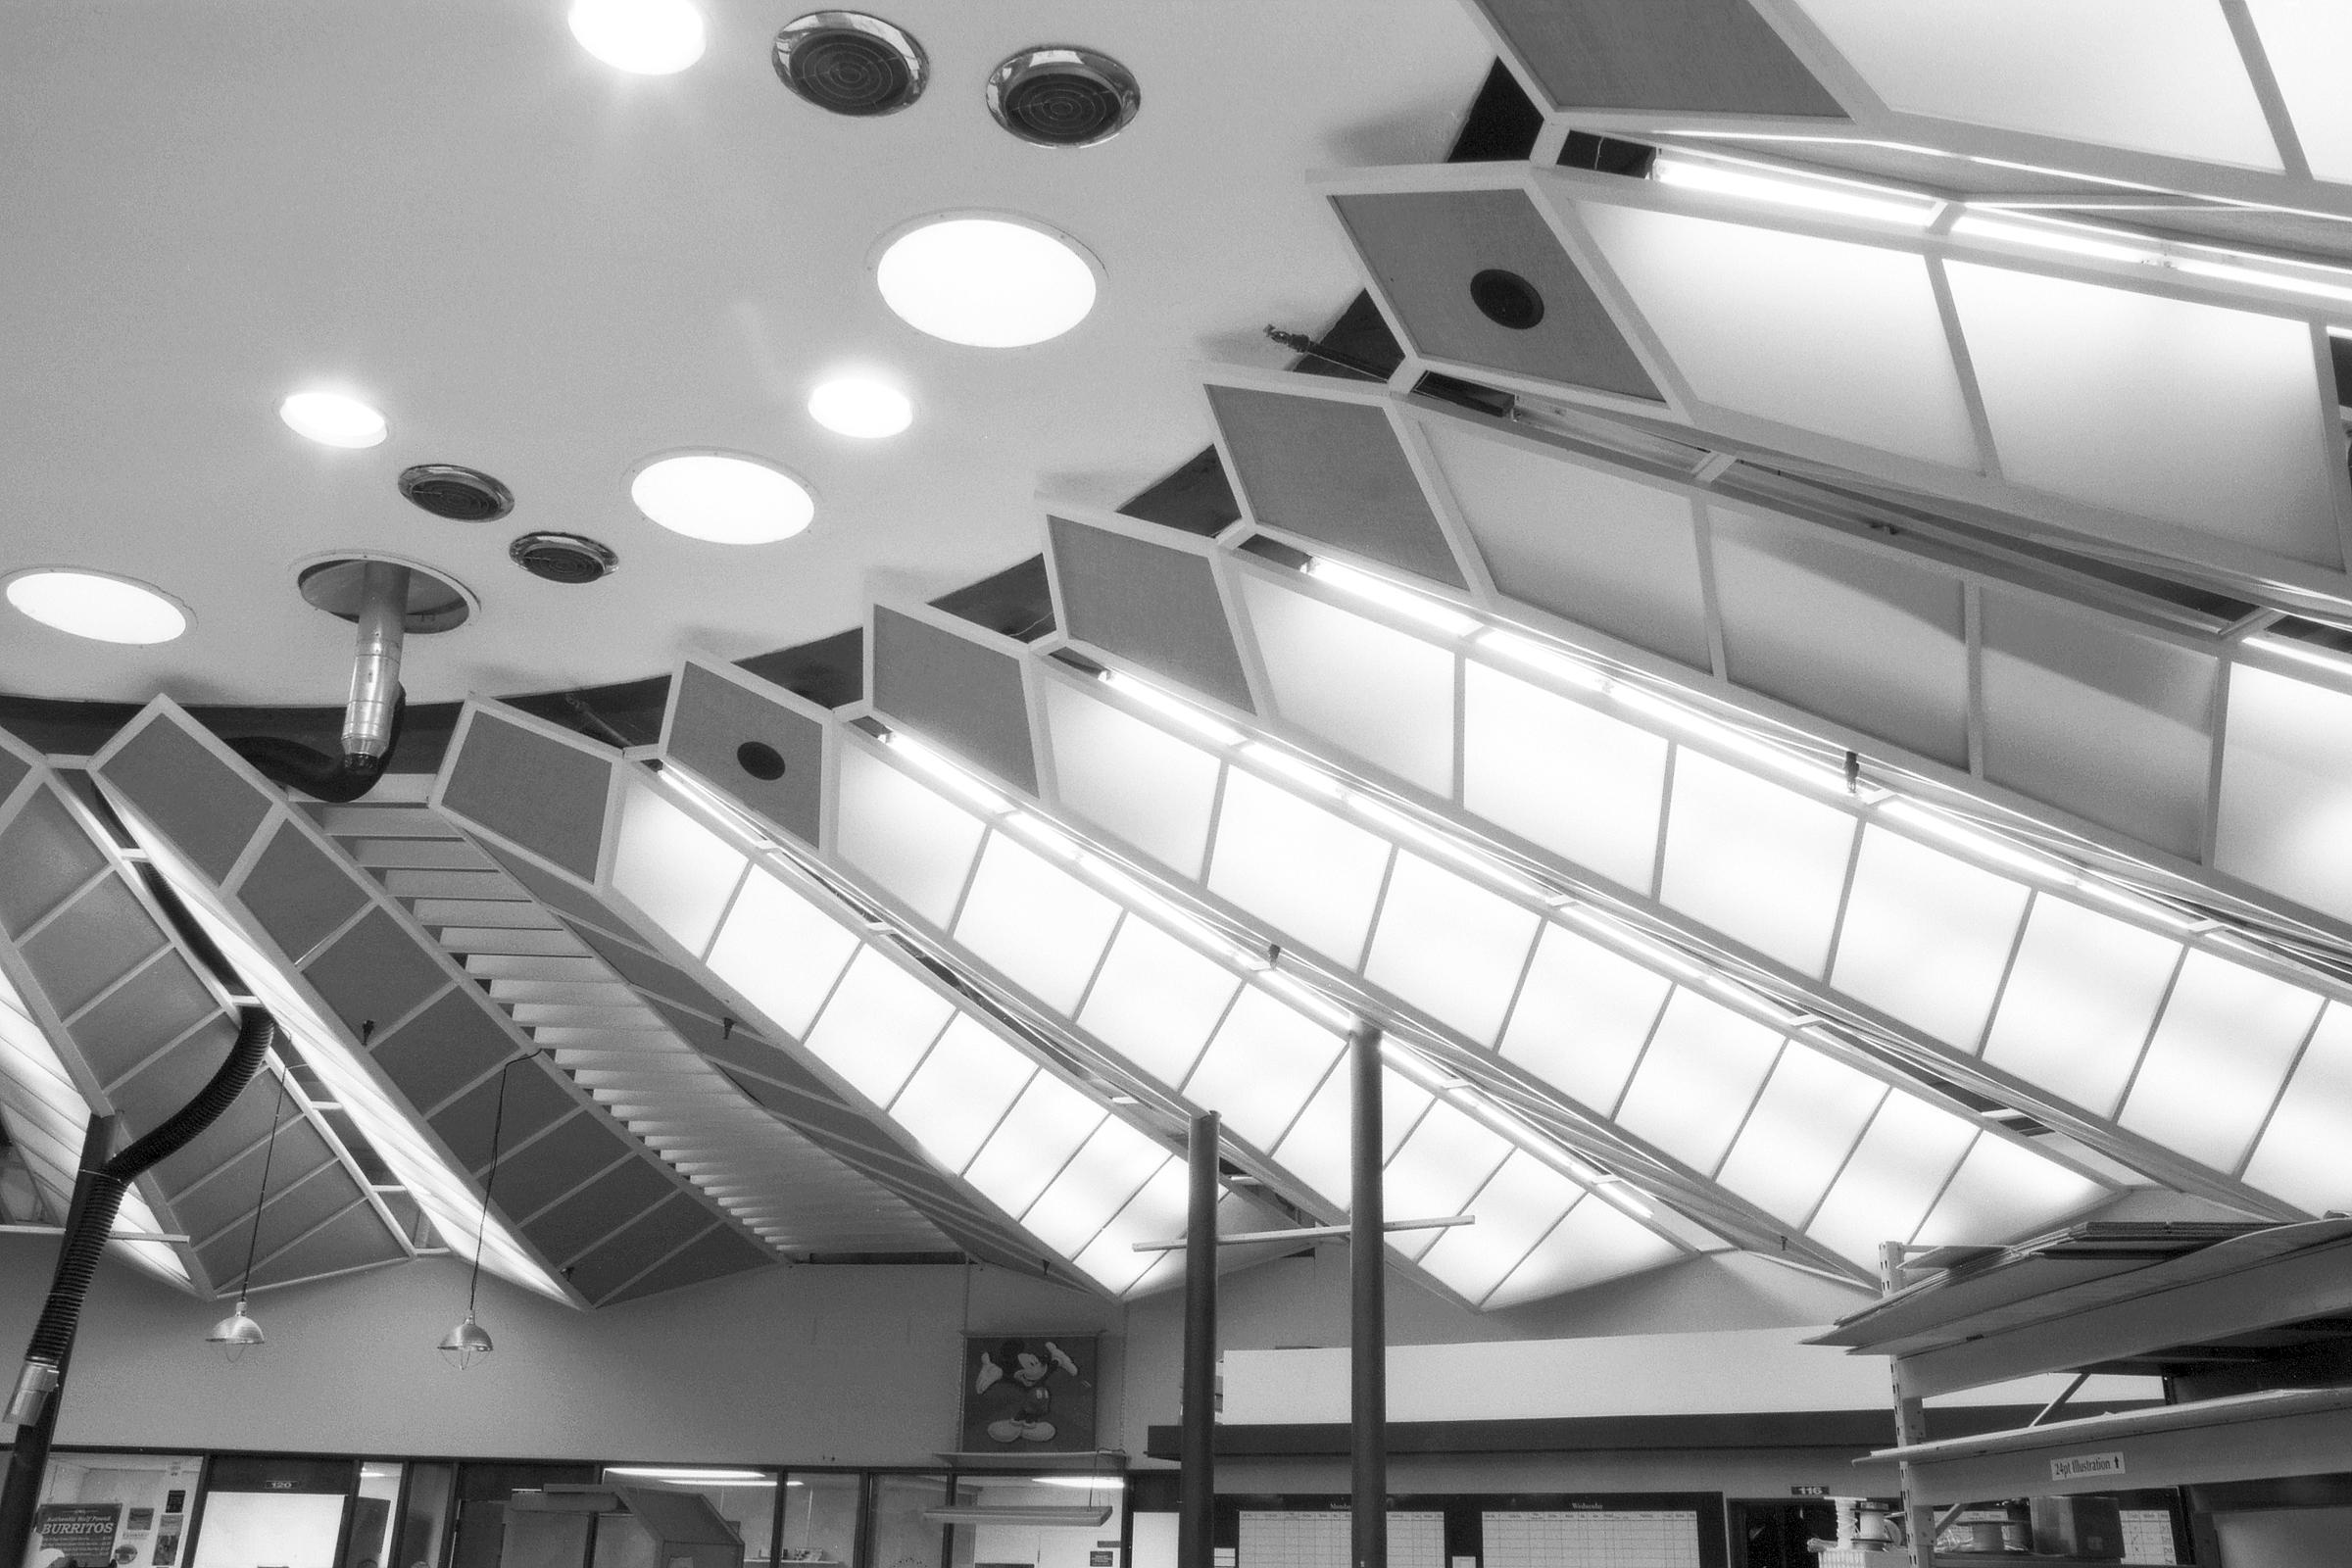 Atrium Lights - MHPR HE-SLC-055-11 (Please credit Daniel R. Pratt and the Minnesota Historic Property Record)